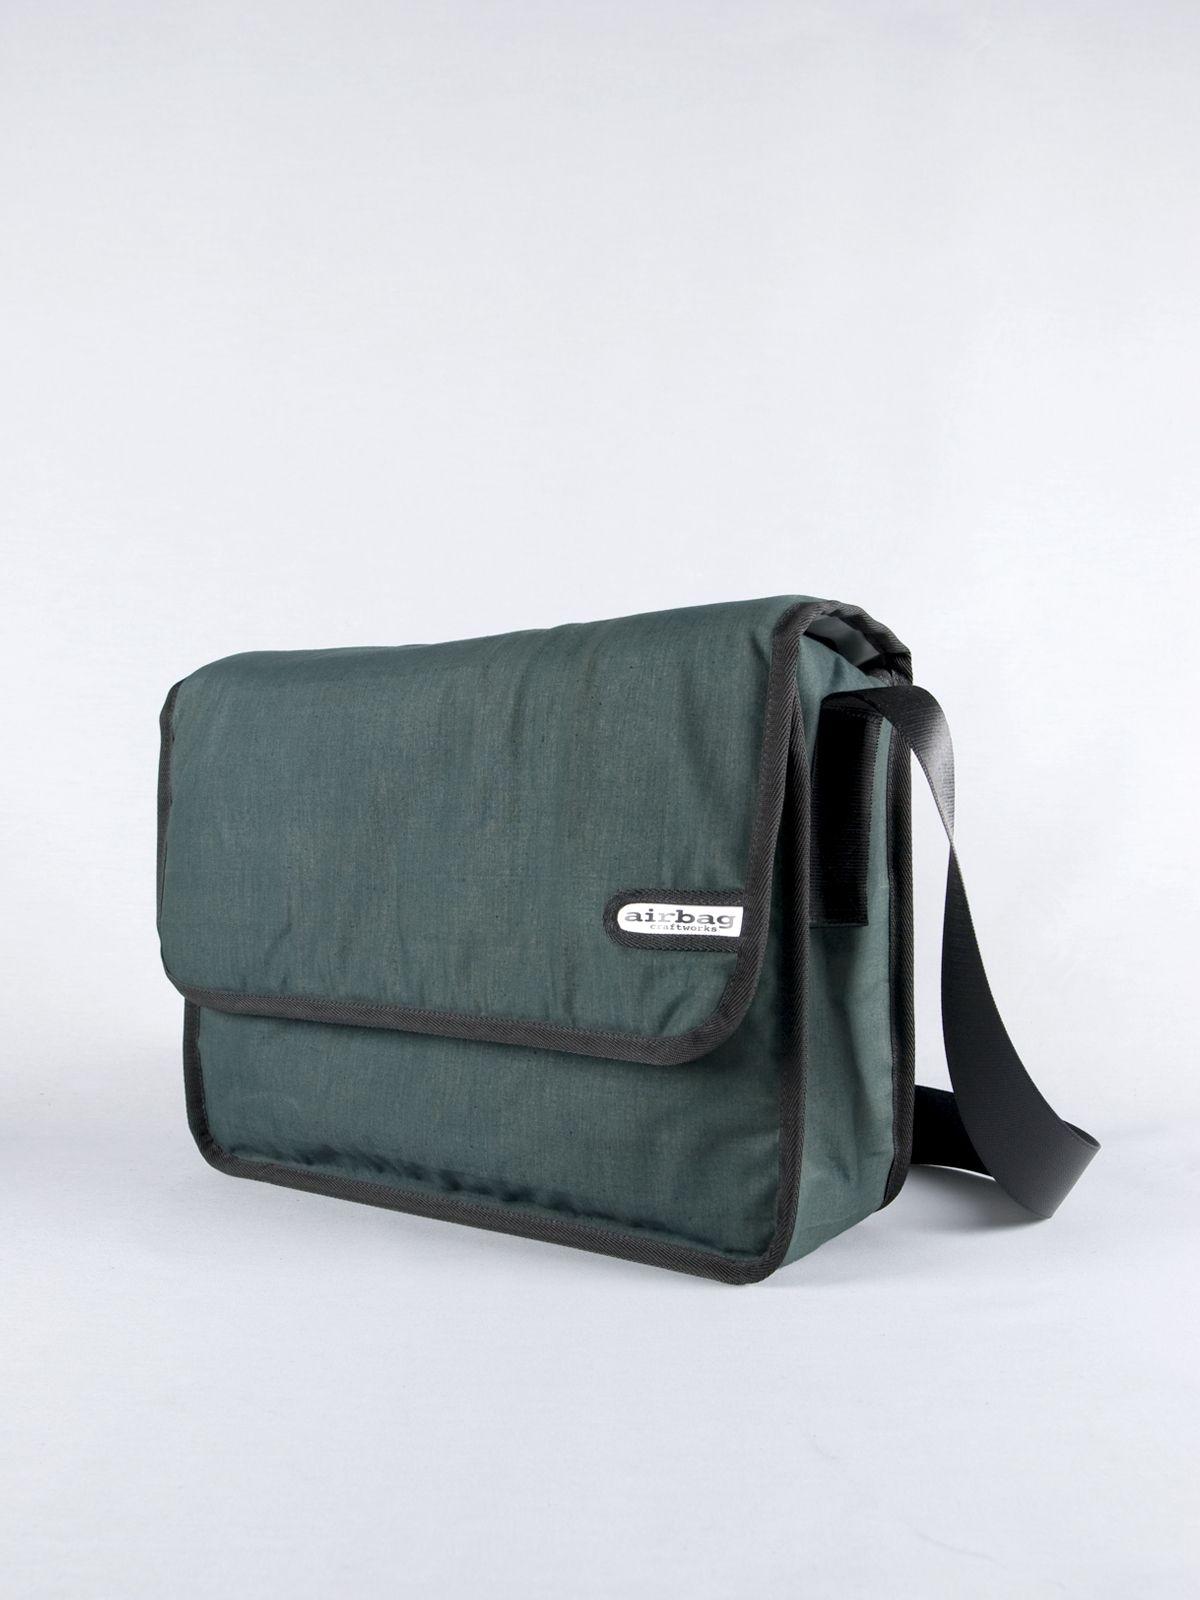 airbag craftworks 119